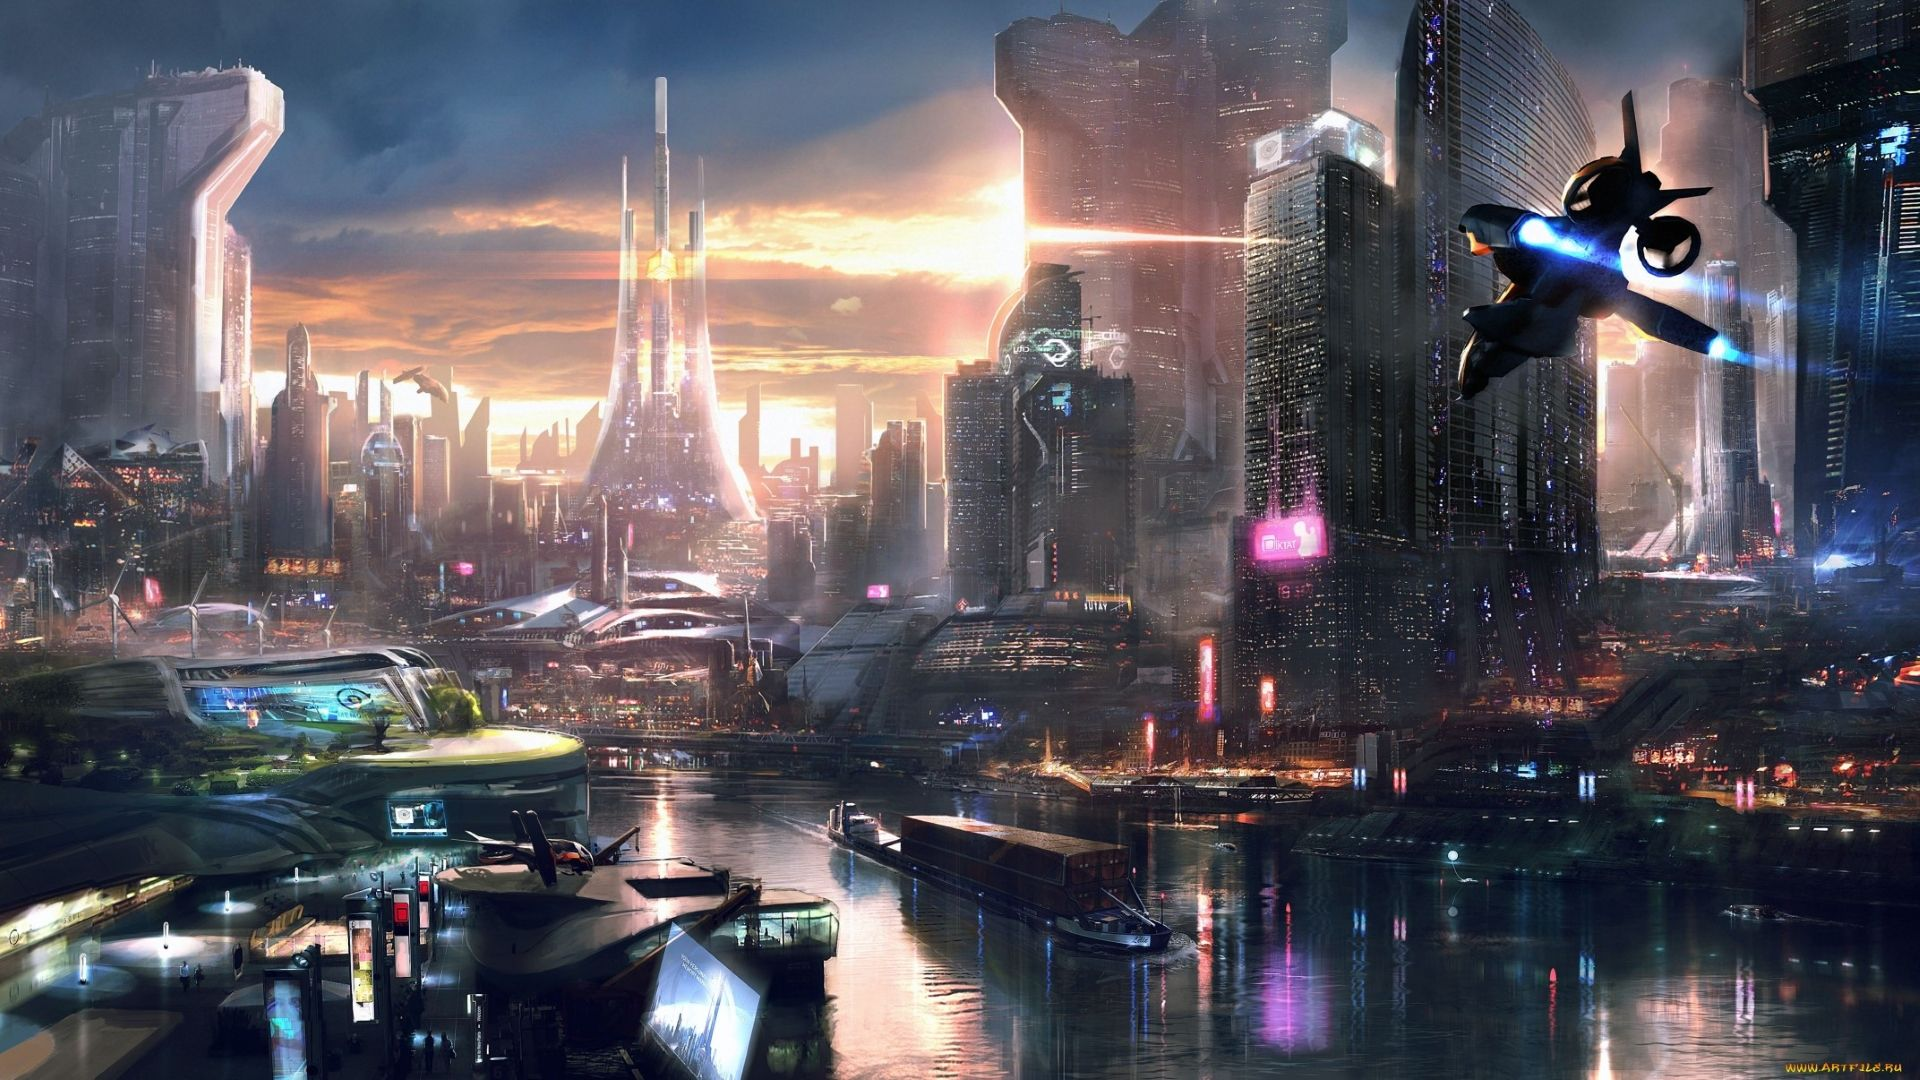 Science Fiction Wallpapers 1920x1080 Futuristic City Sci Fi City Cyberpunk City